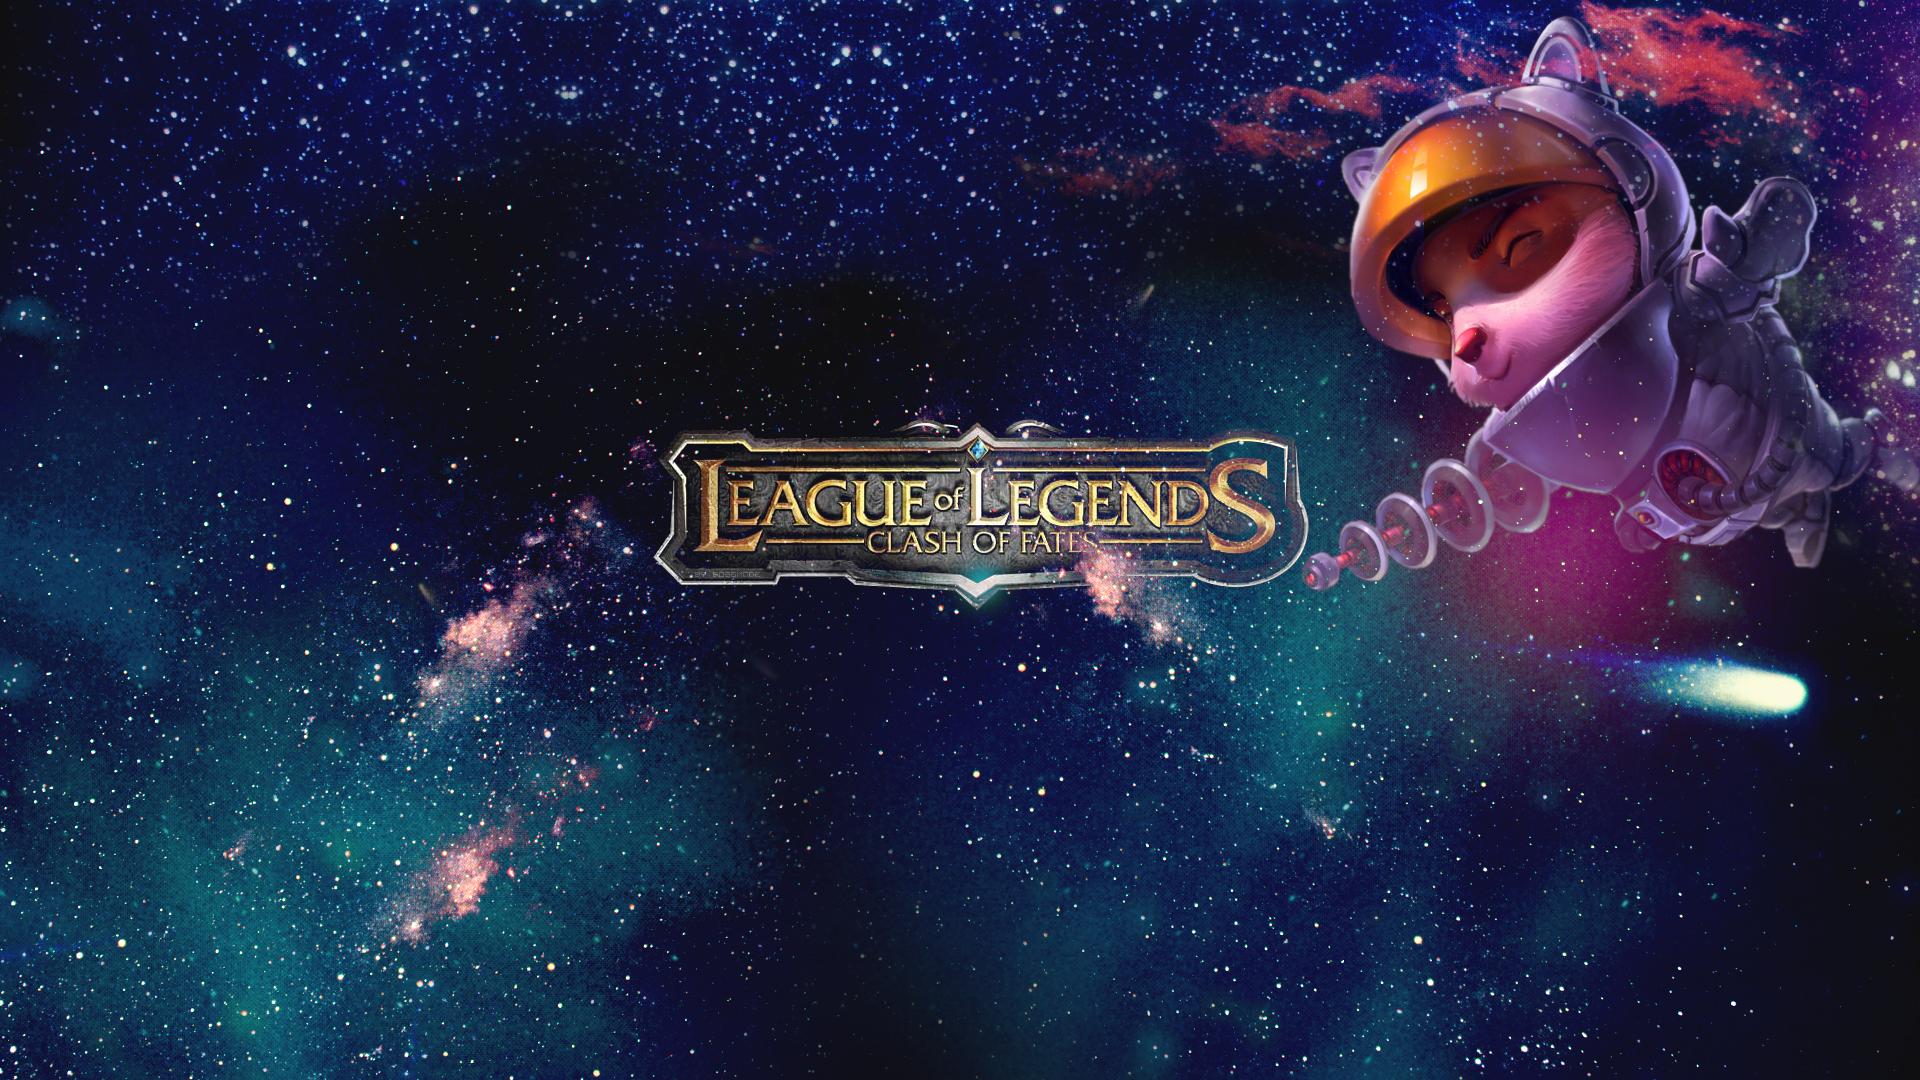 73 teemo league of legends hd wallpapers backgrounds - League desktop backgrounds ...